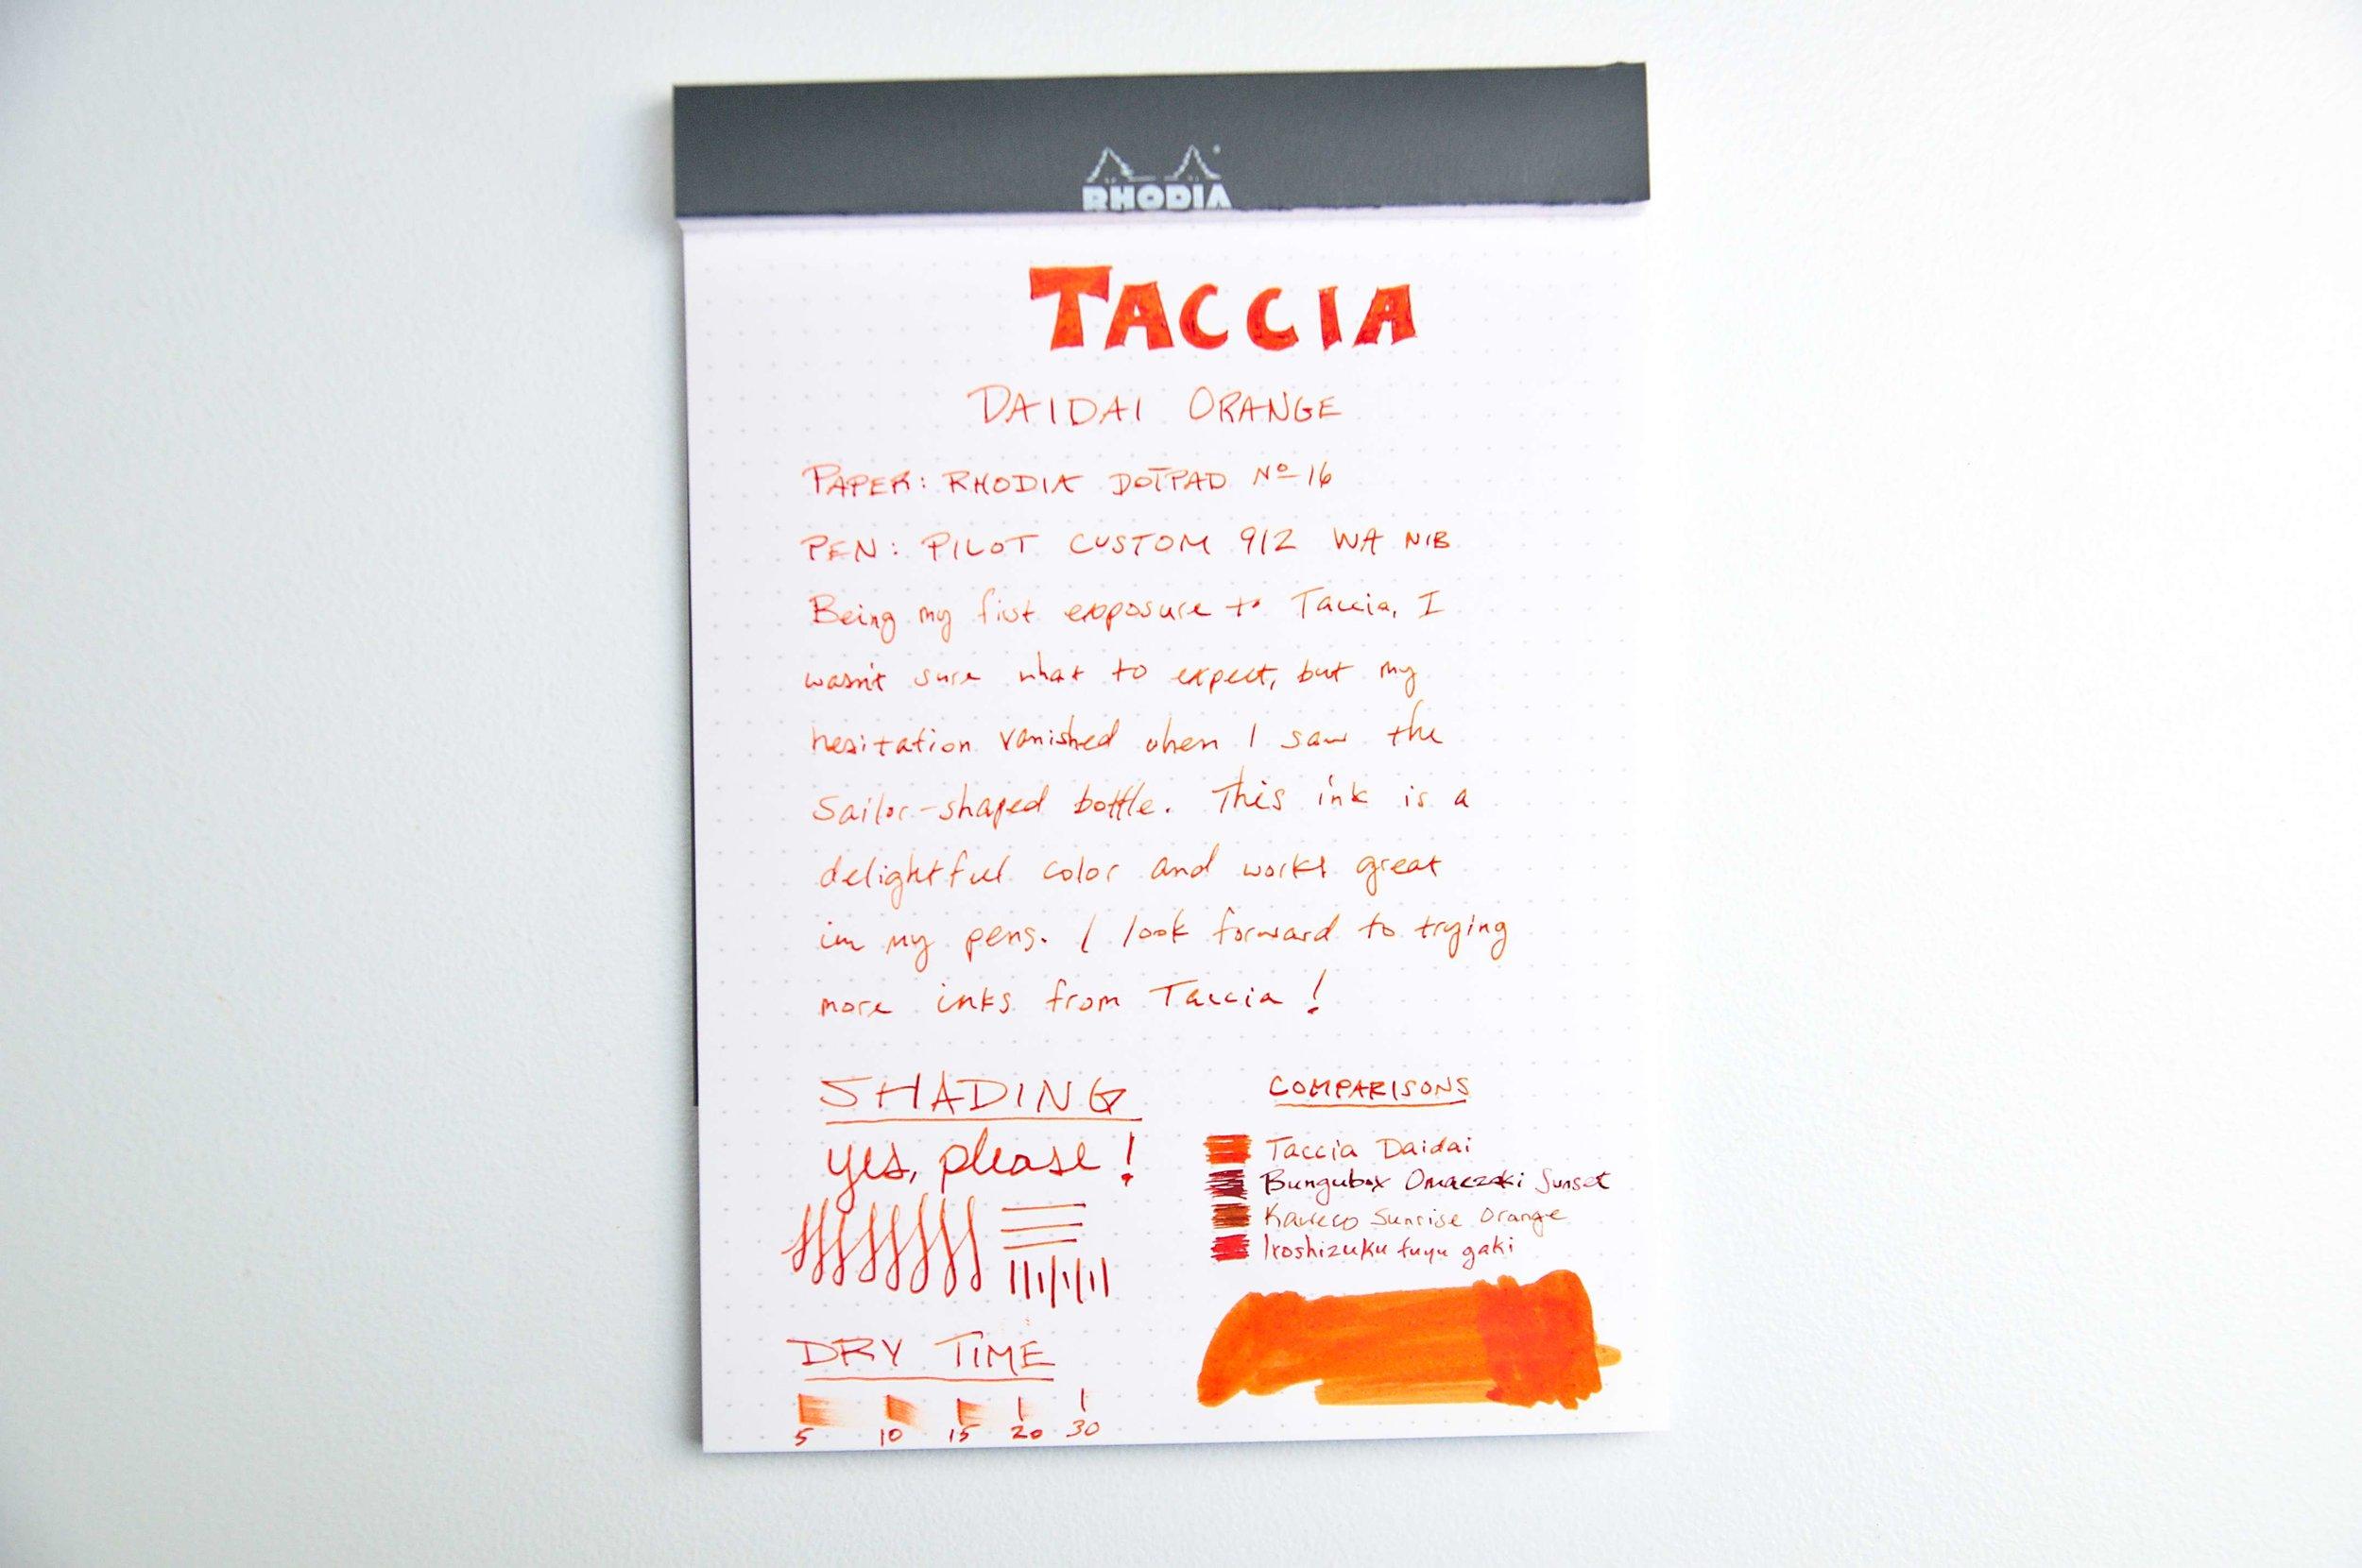 Taccia Daidai Review